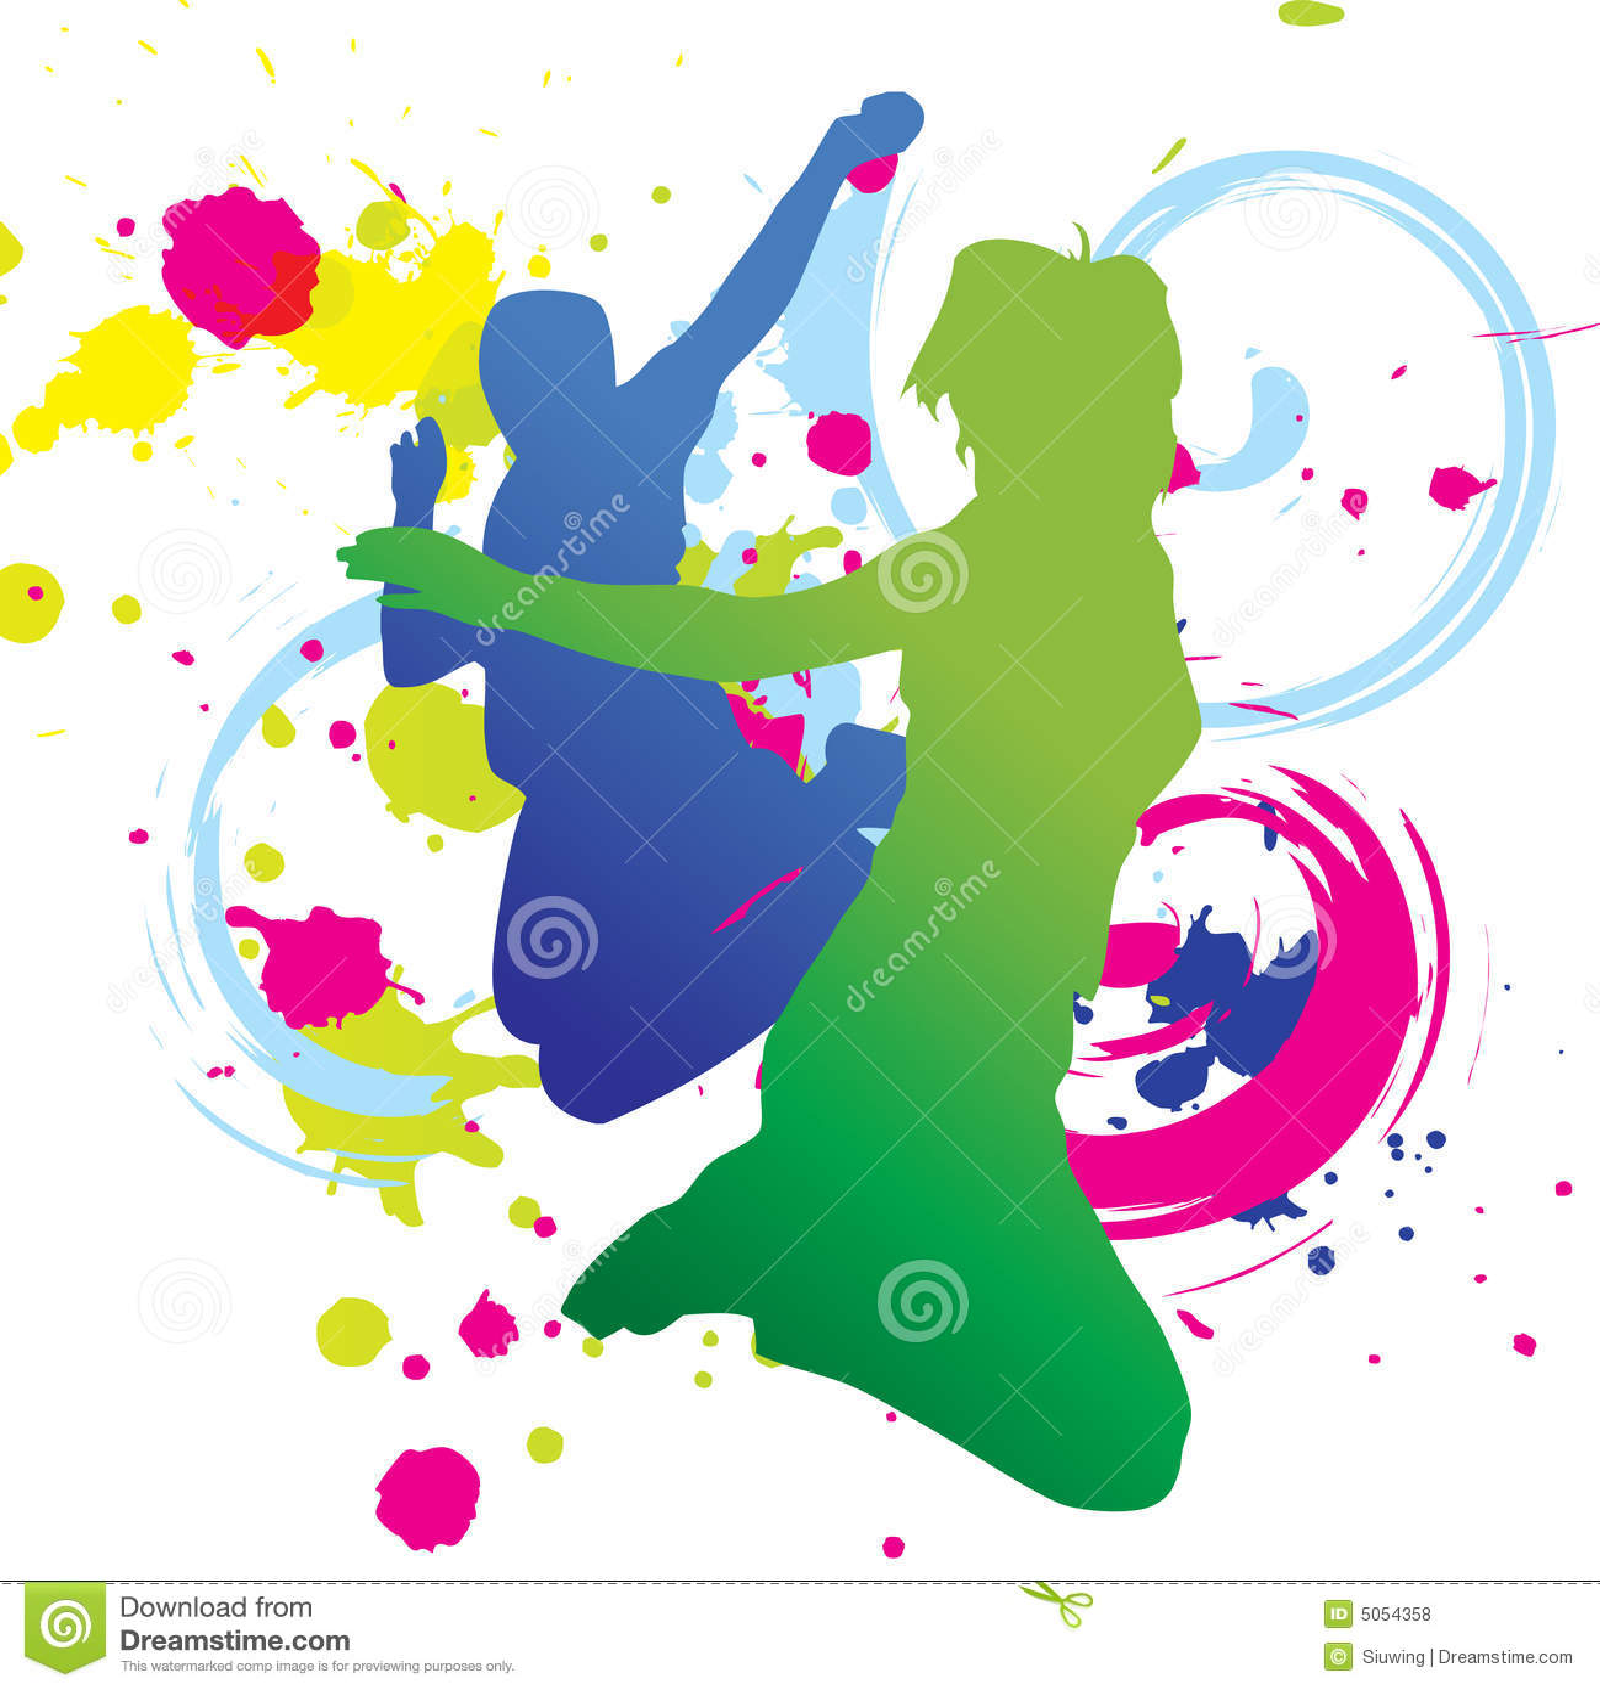 Dance Graphic Design Poster